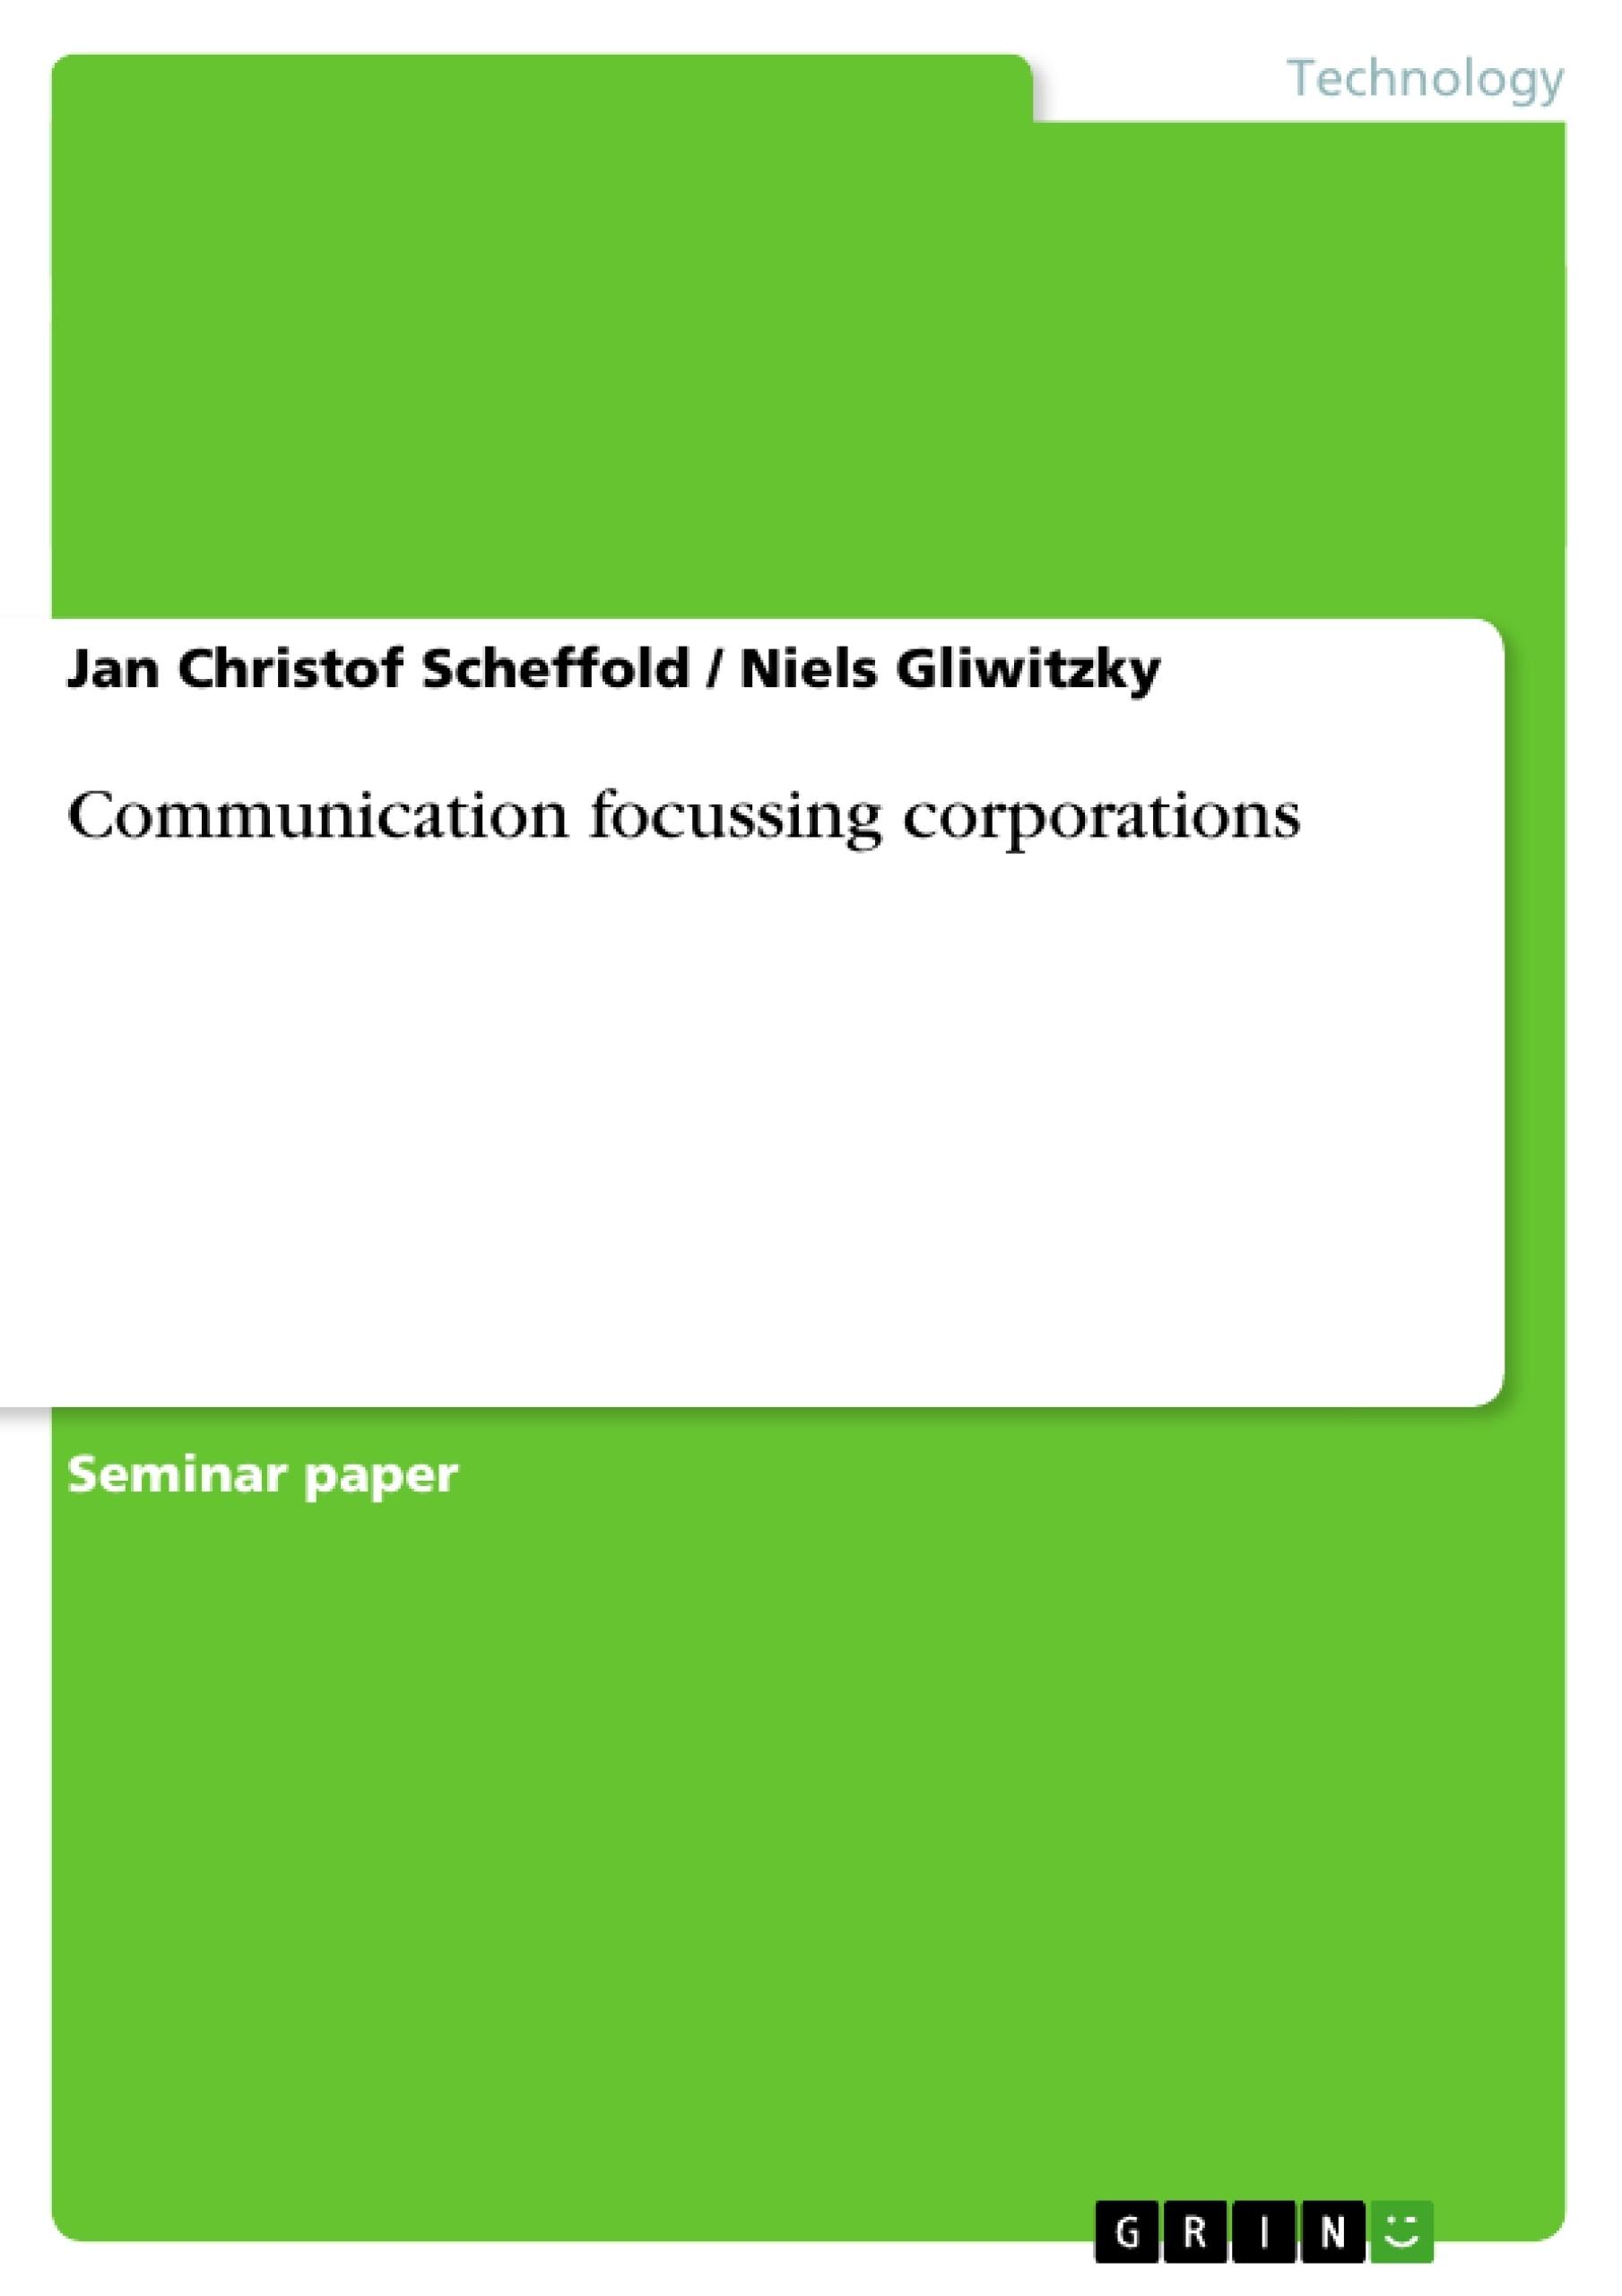 Title: Communication focussing corporations